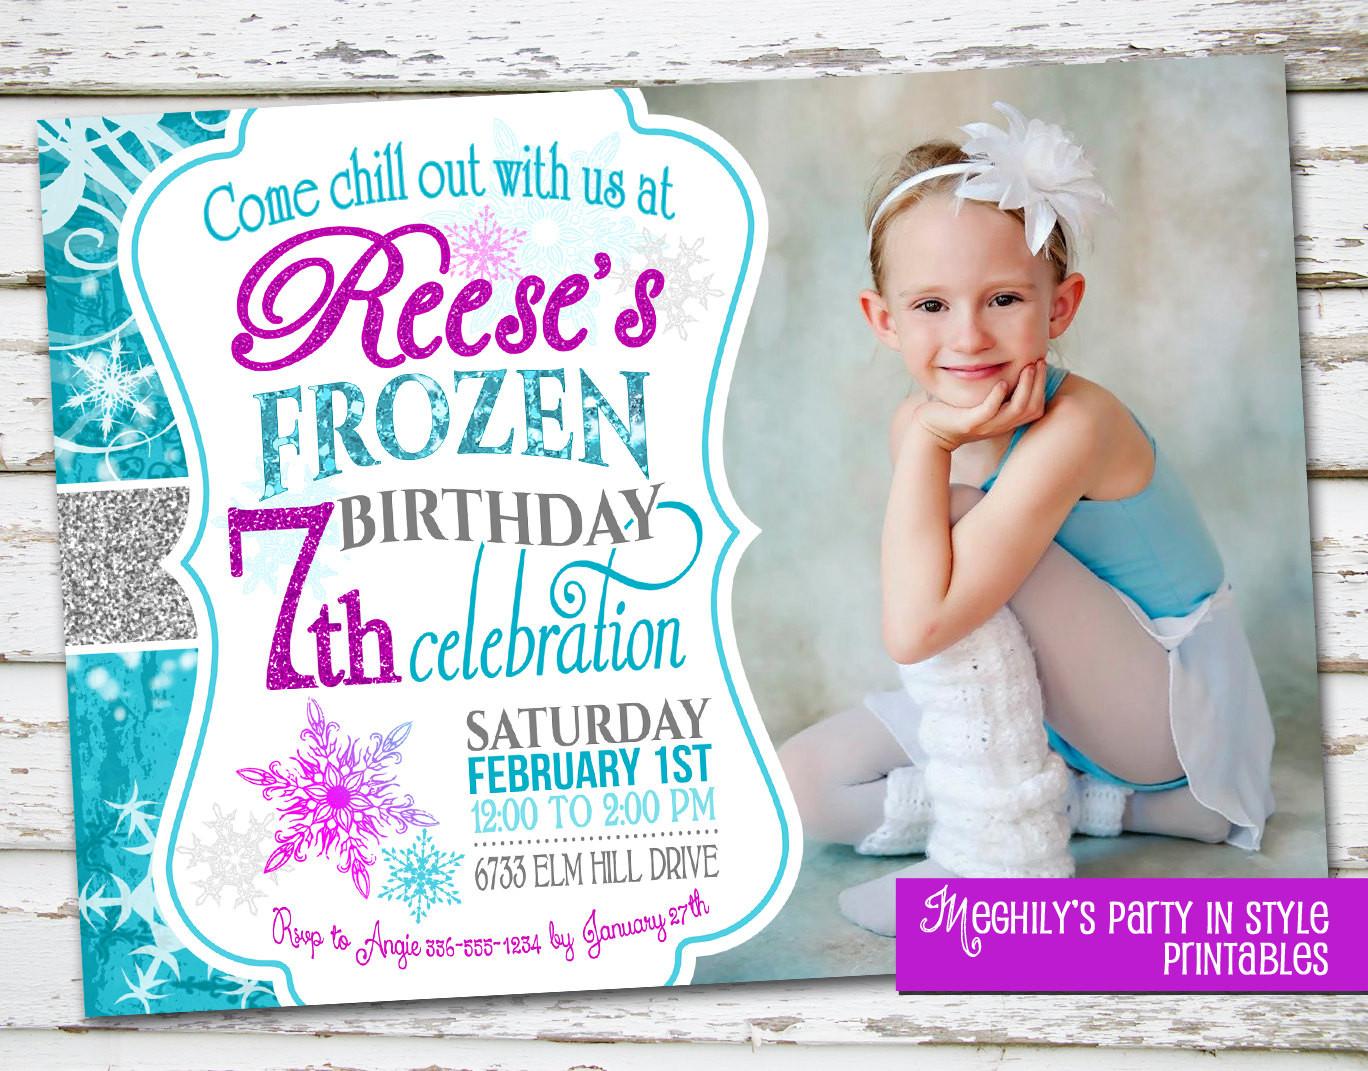 Best ideas about Frozen Birthday Party Invitations . Save or Pin Frozen Birthday Invitation with Now.